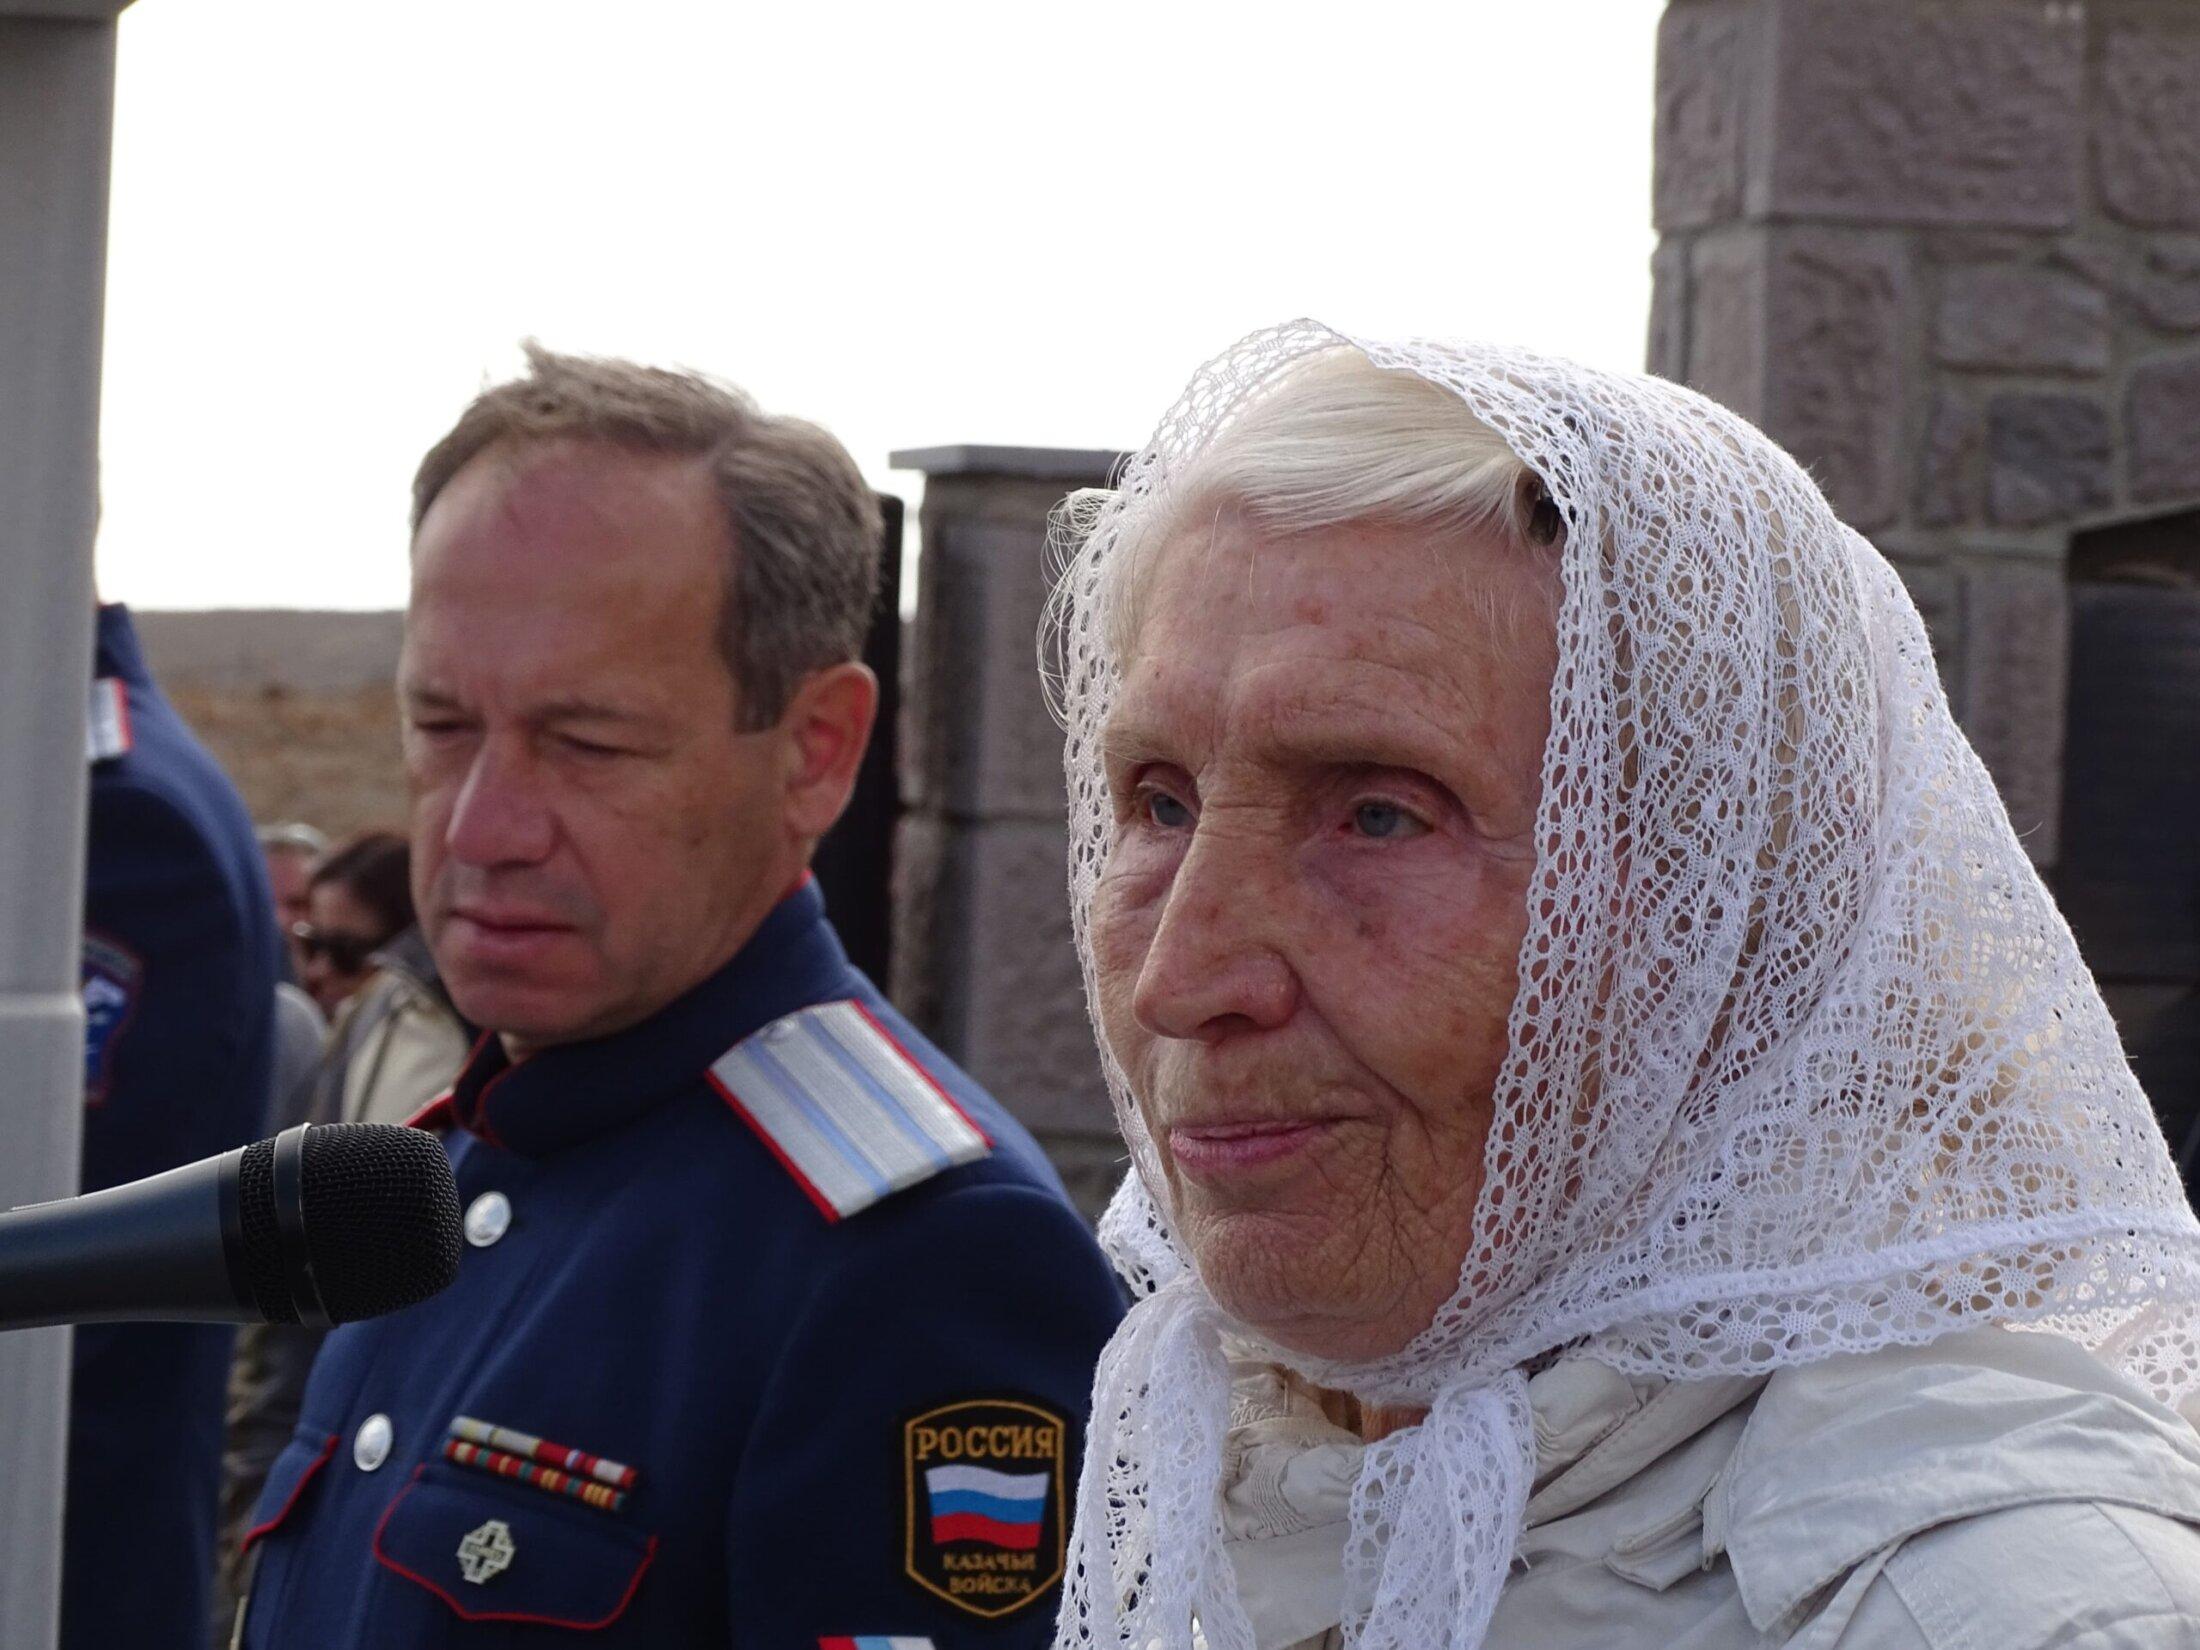 russkie_dni_na_lemnose_2015_45